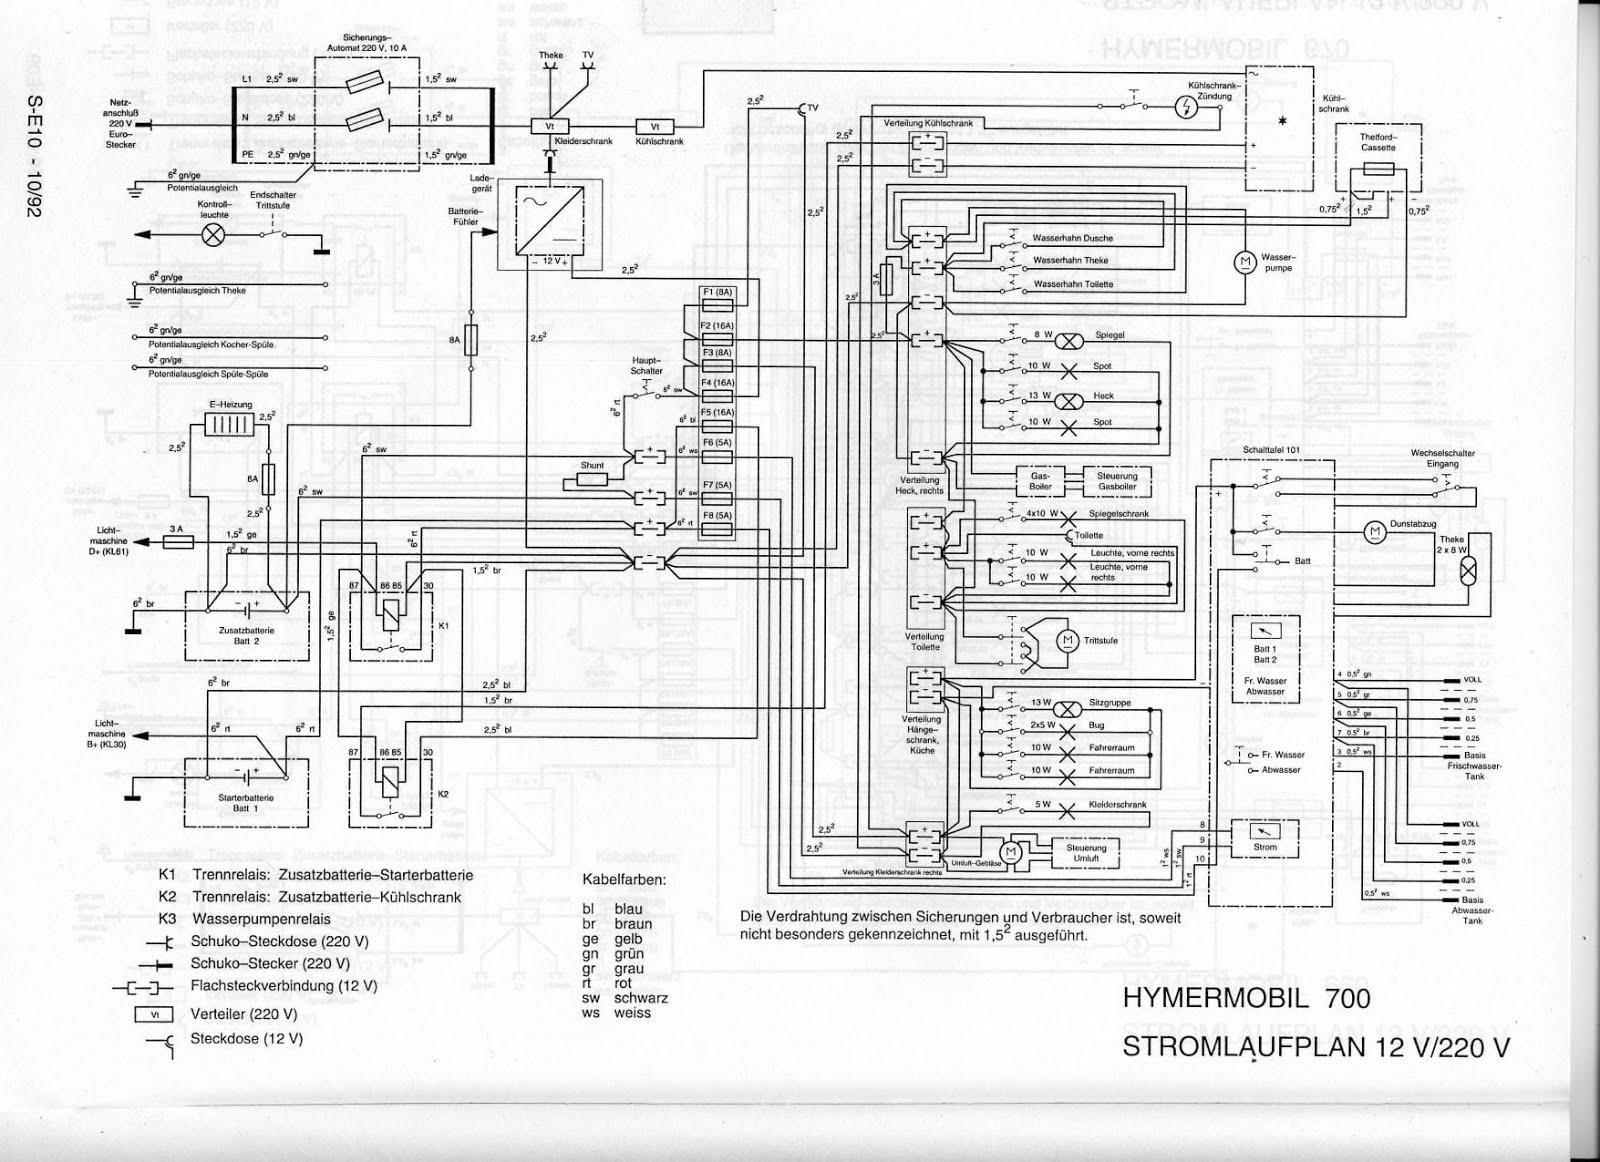 Hymer Caravan Wiring Diagram - Caterpillar Voltage Regulator Wiring Diagram  - enginee-diagrams.tukune.jeanjaures37.fr   Hymer Caravan Wiring Diagram      Wiring Diagram Resource